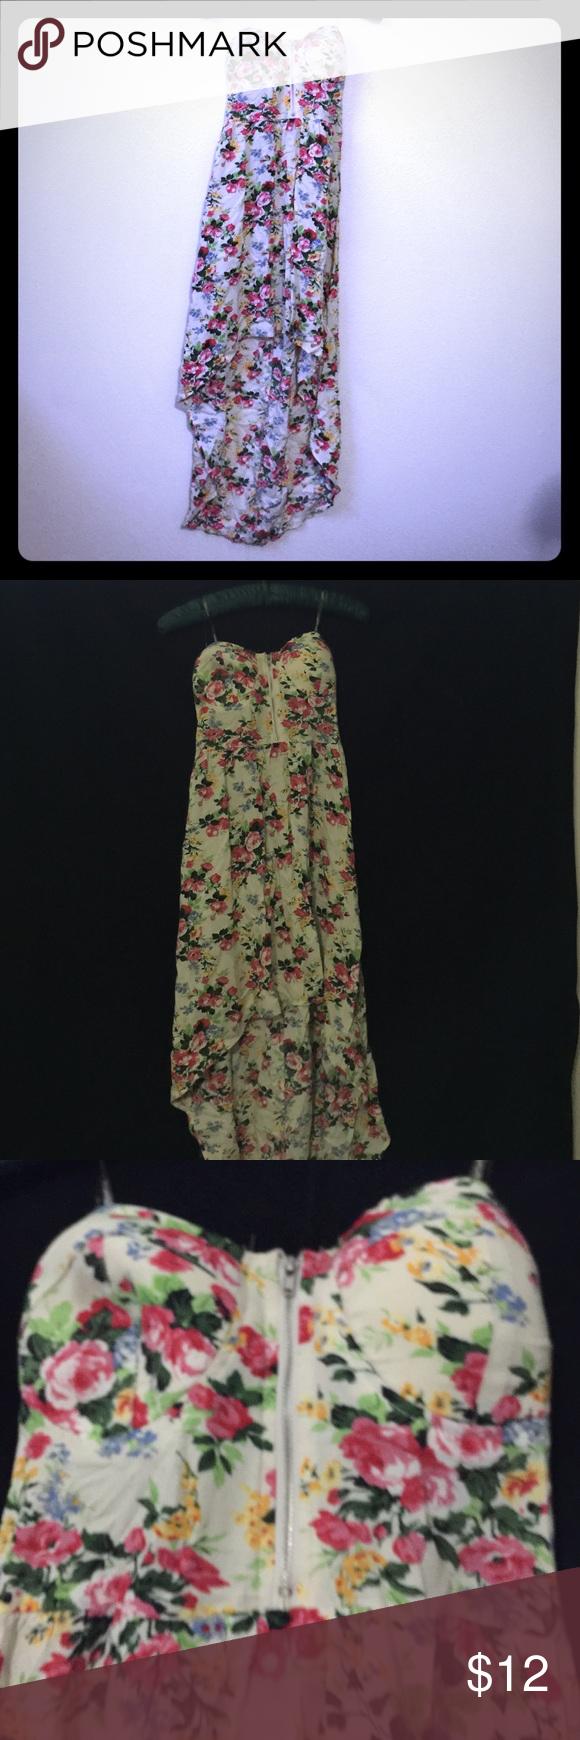 Strapless dress Summer dress Dresses Strapless